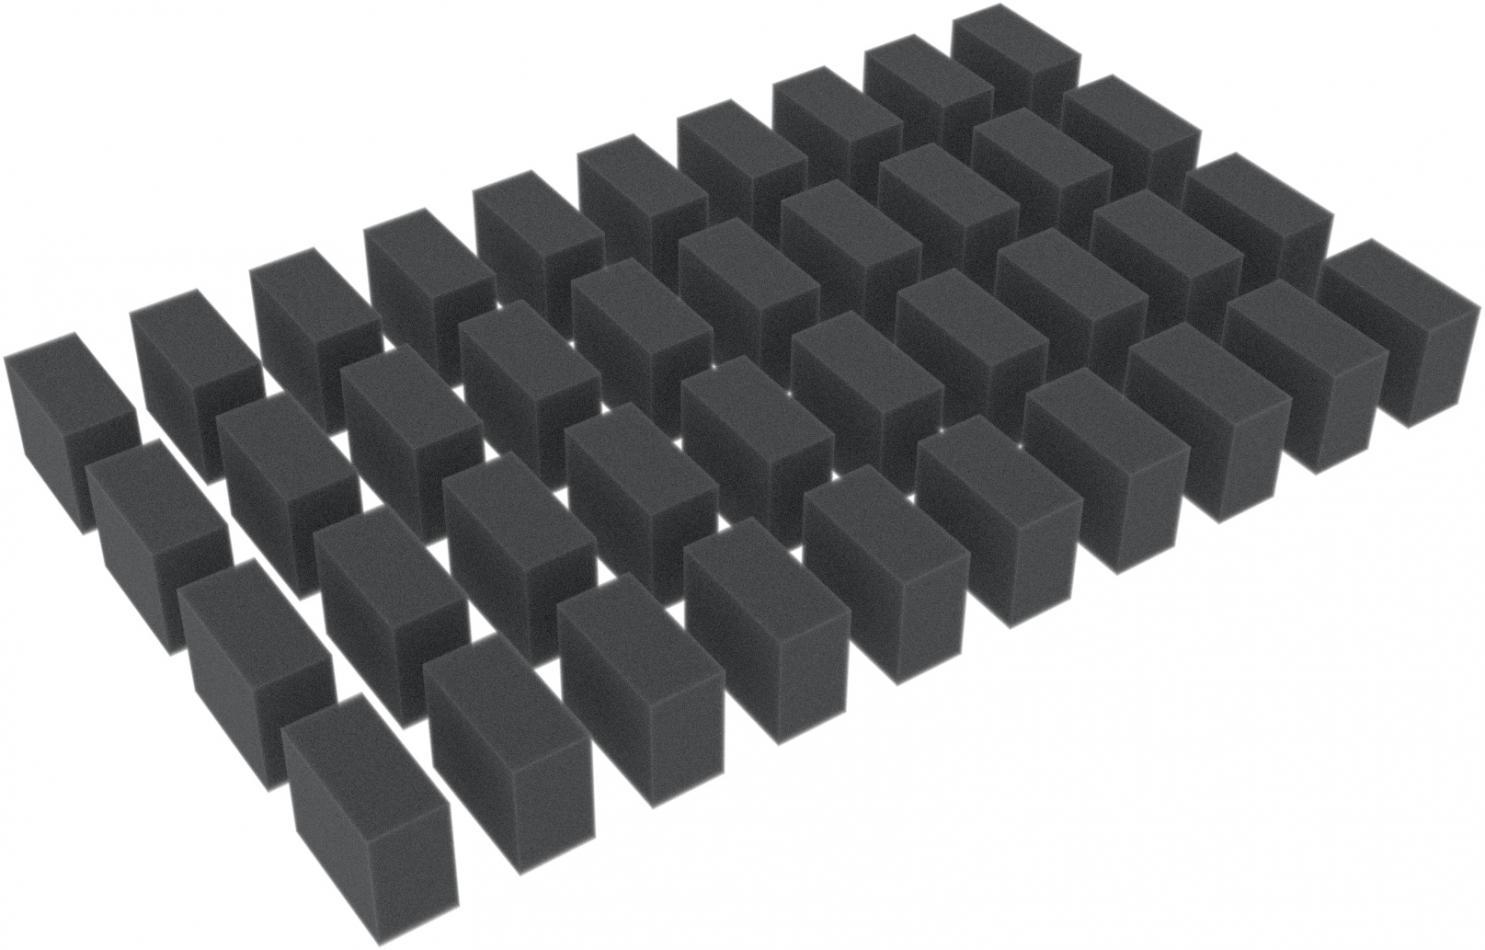 30 spacers / foam blocks / cuboids 30 mm x 25 mm x 15 mm